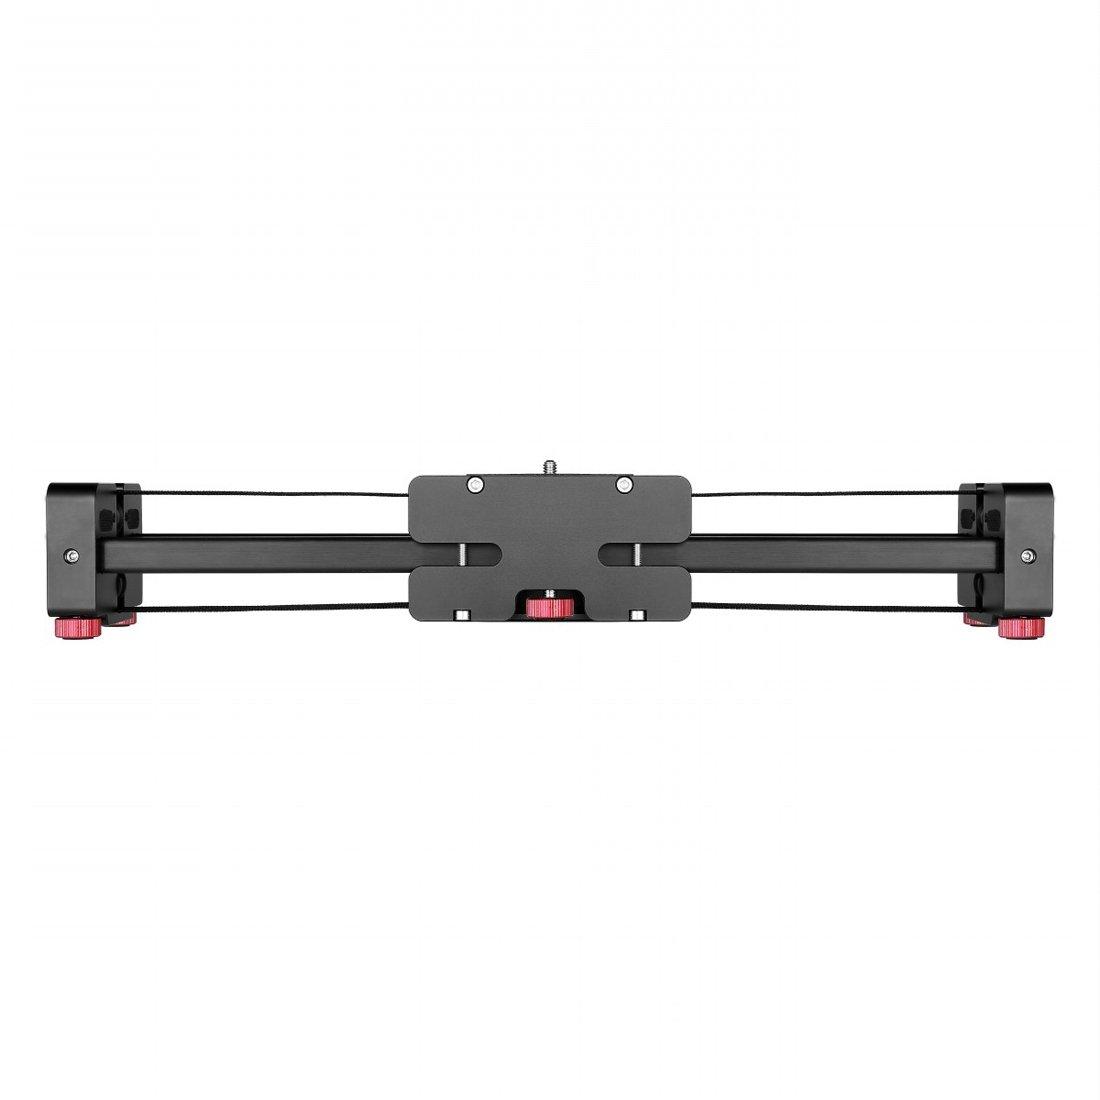 XIAOMIN FT-52 Portable 48cm / 102cm (Installs on Tripod) Slide Rail Track for DSLR/SLR Cameras/Video Cameras (Black) Premium Material (Color : Black) by XIAOMIN